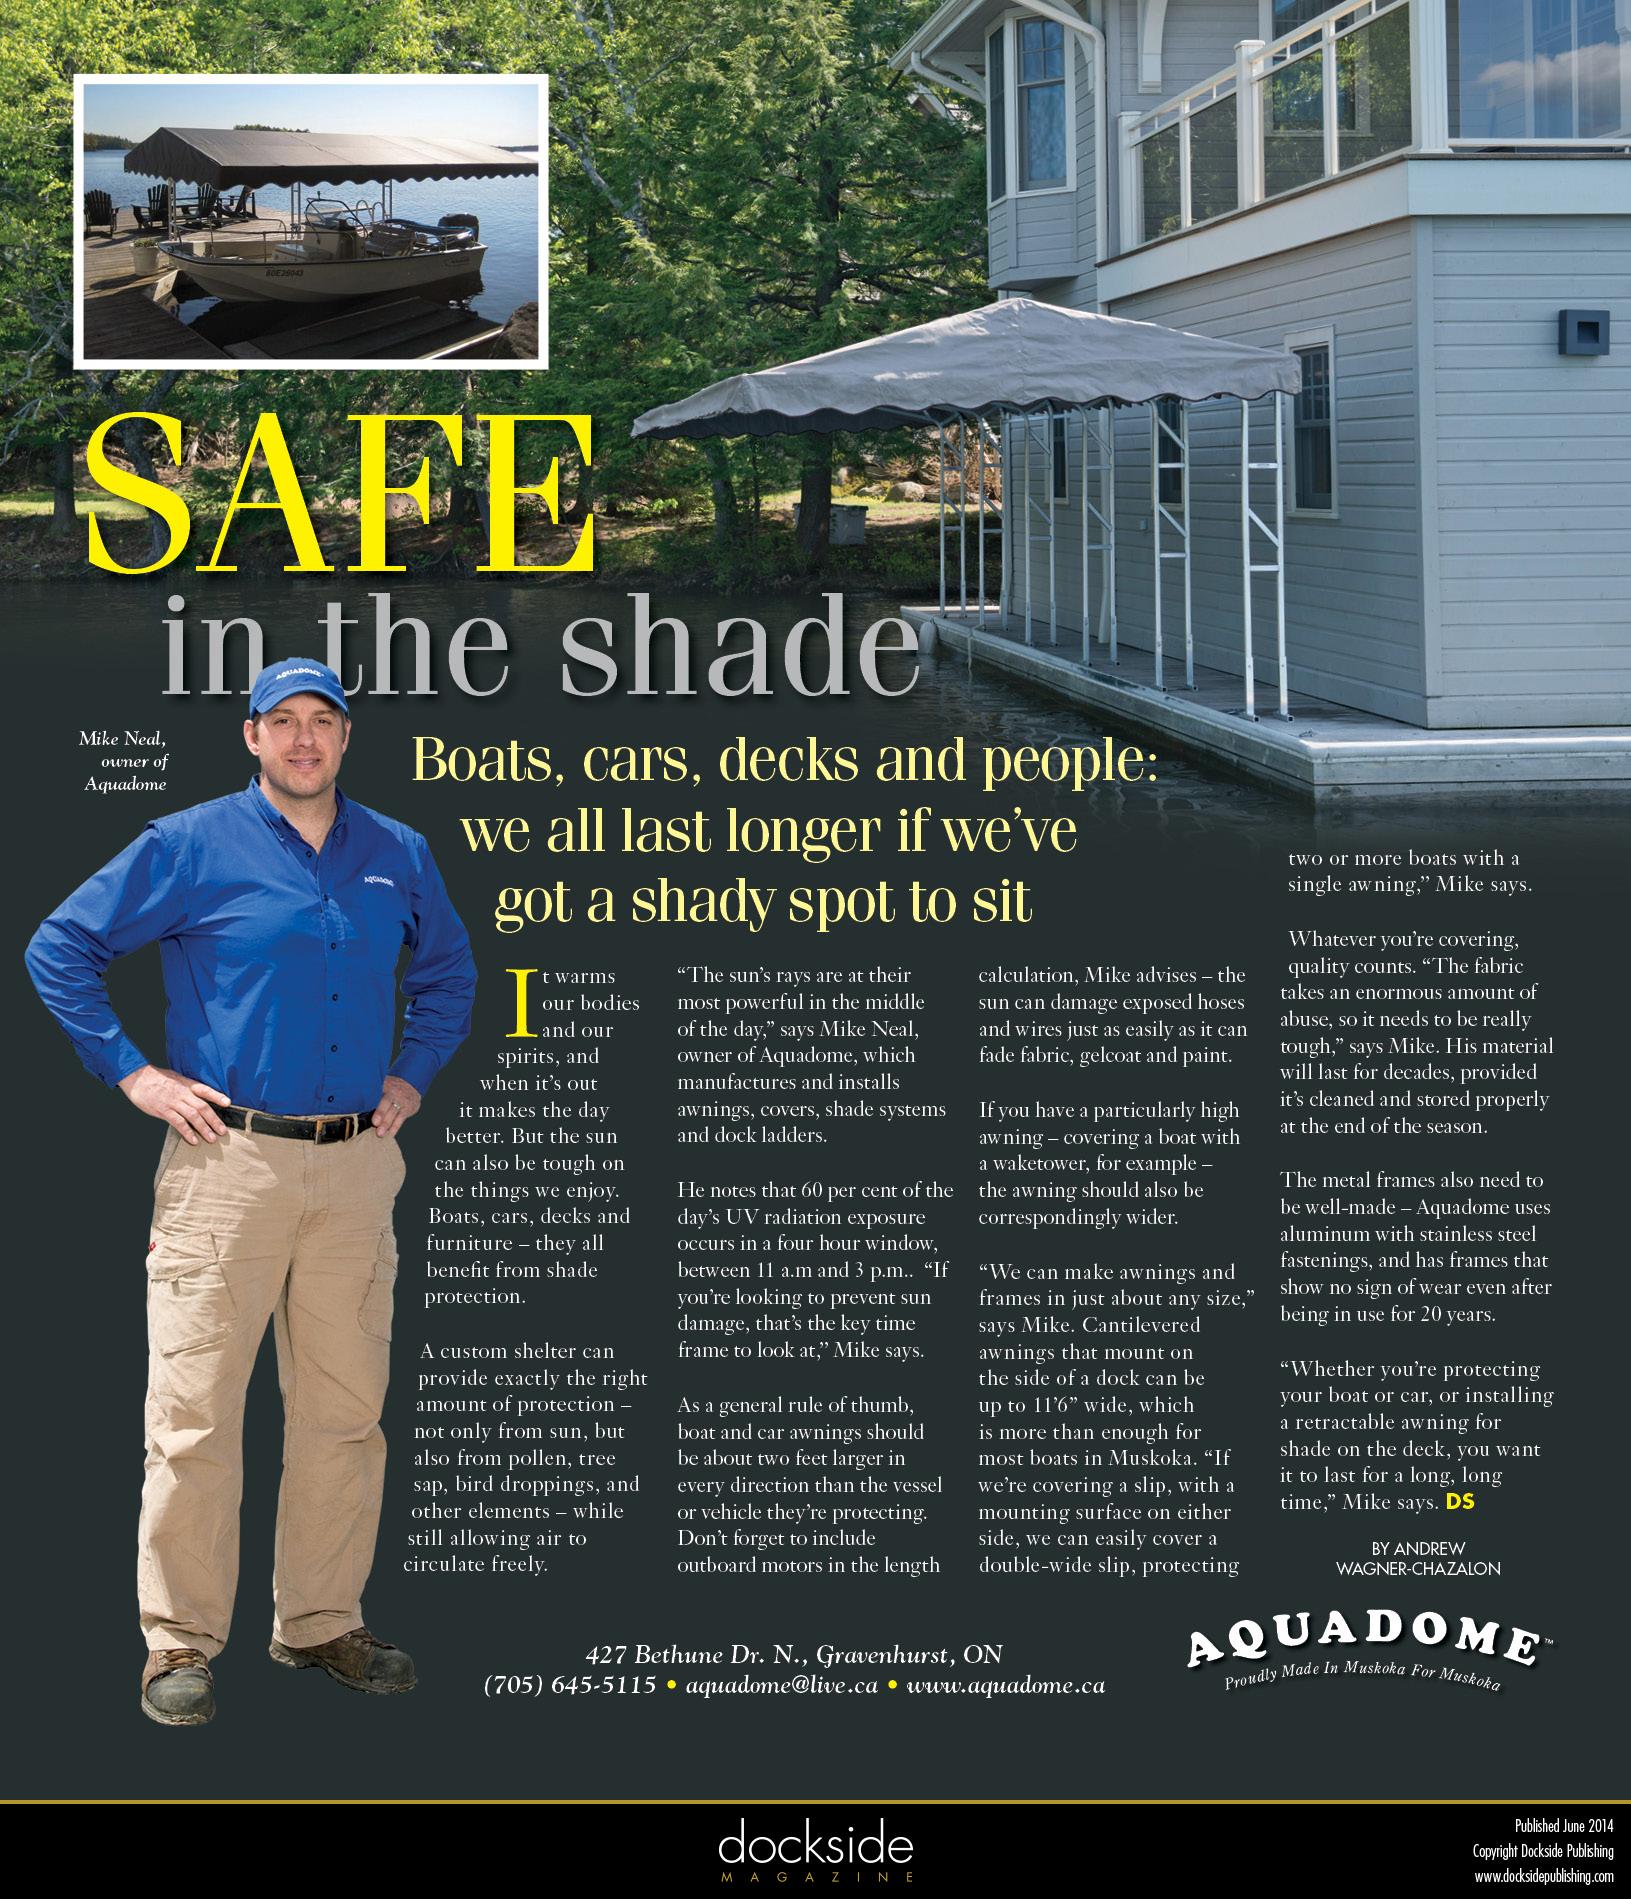 Aquadome - Dockside Magazine June 2014.jpg